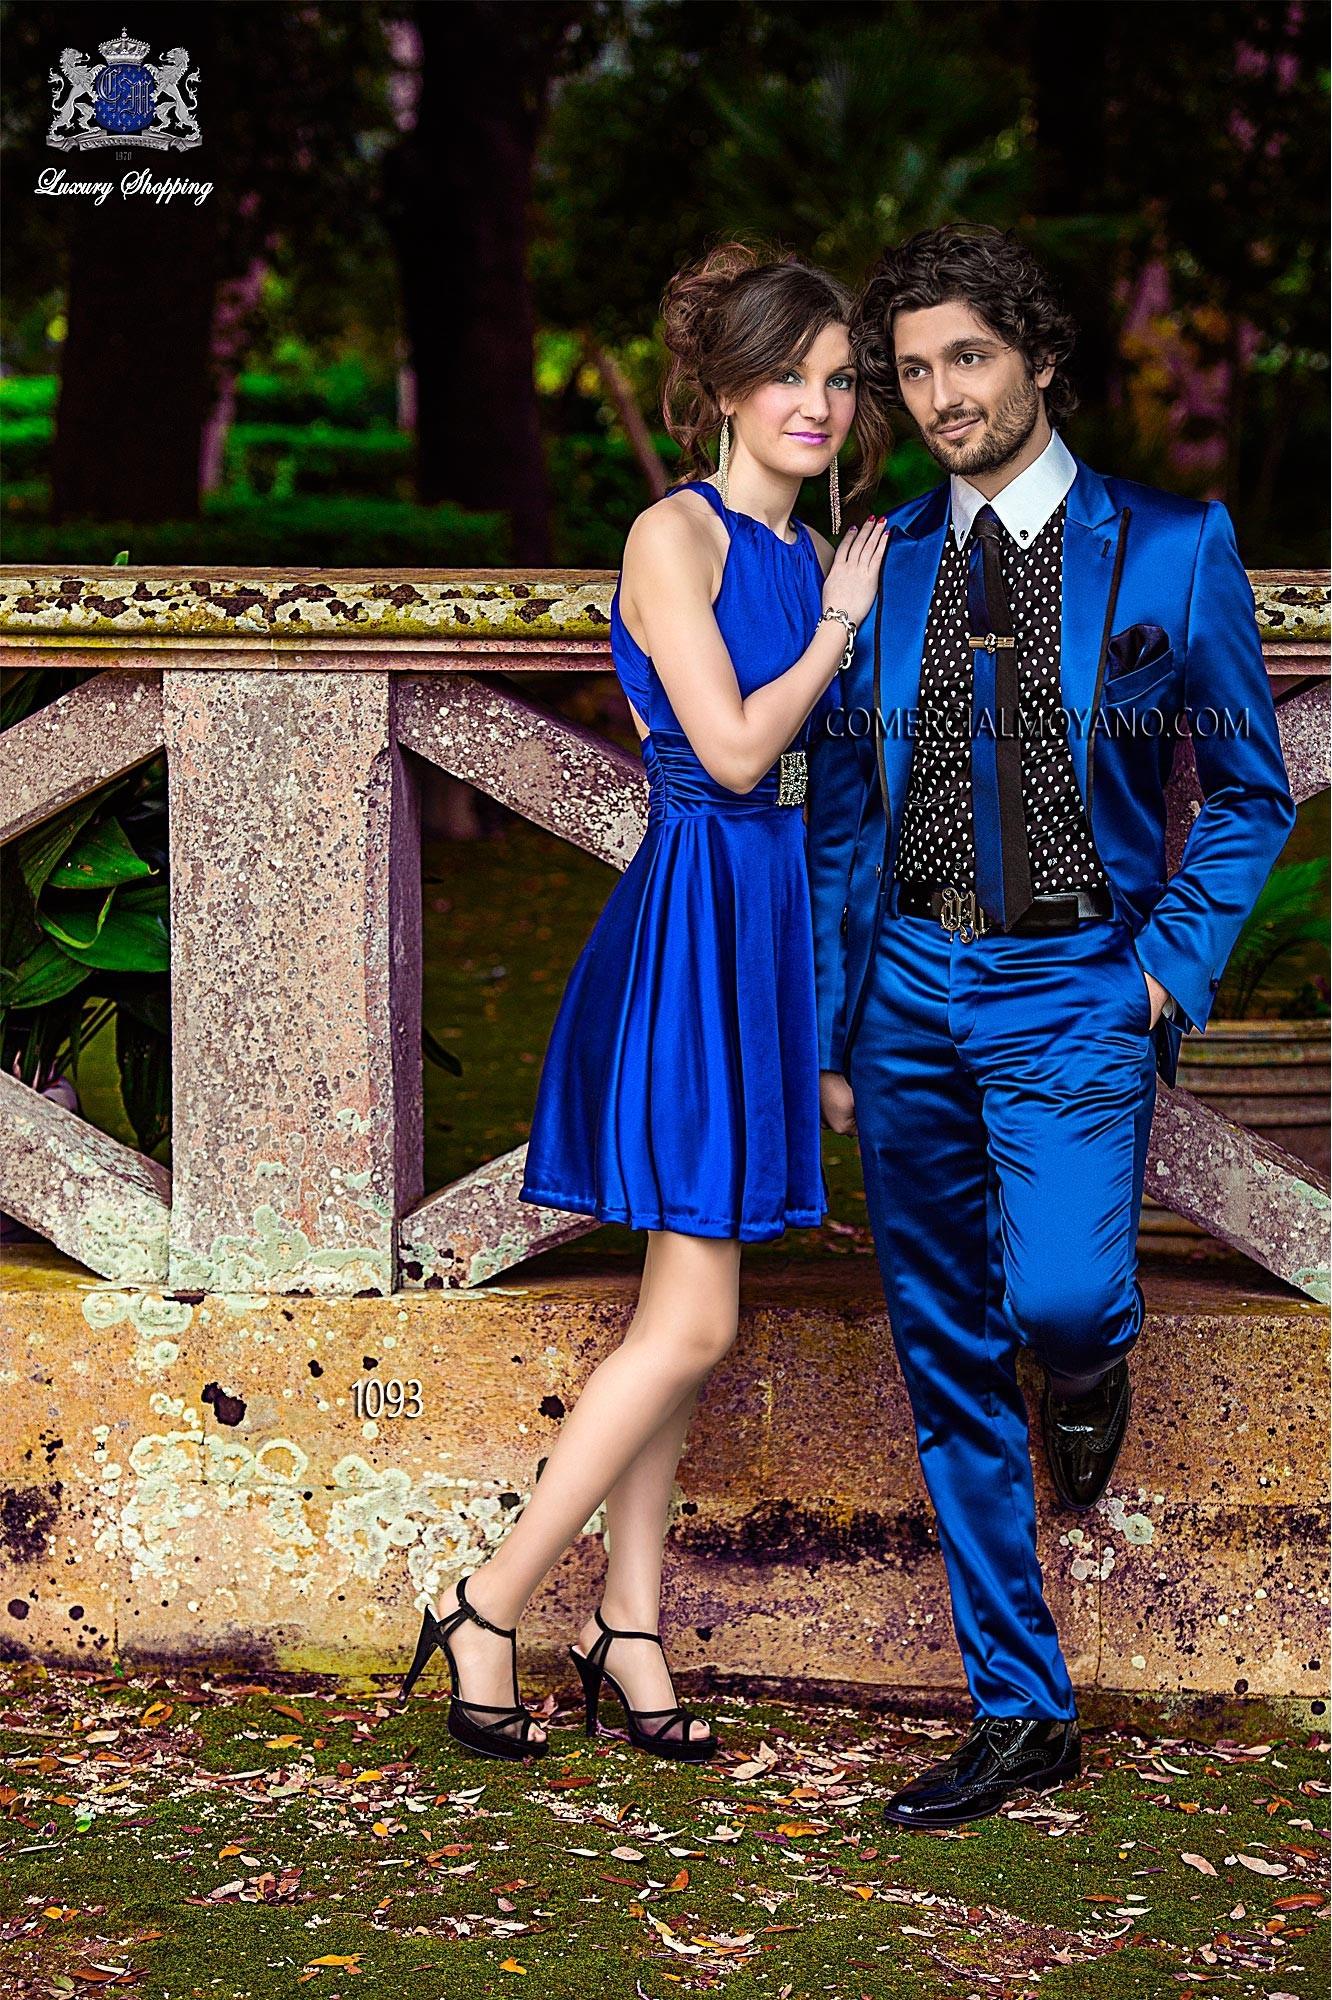 Emotion blue men wedding suit model 1093 Ottavio Nuccio Gala